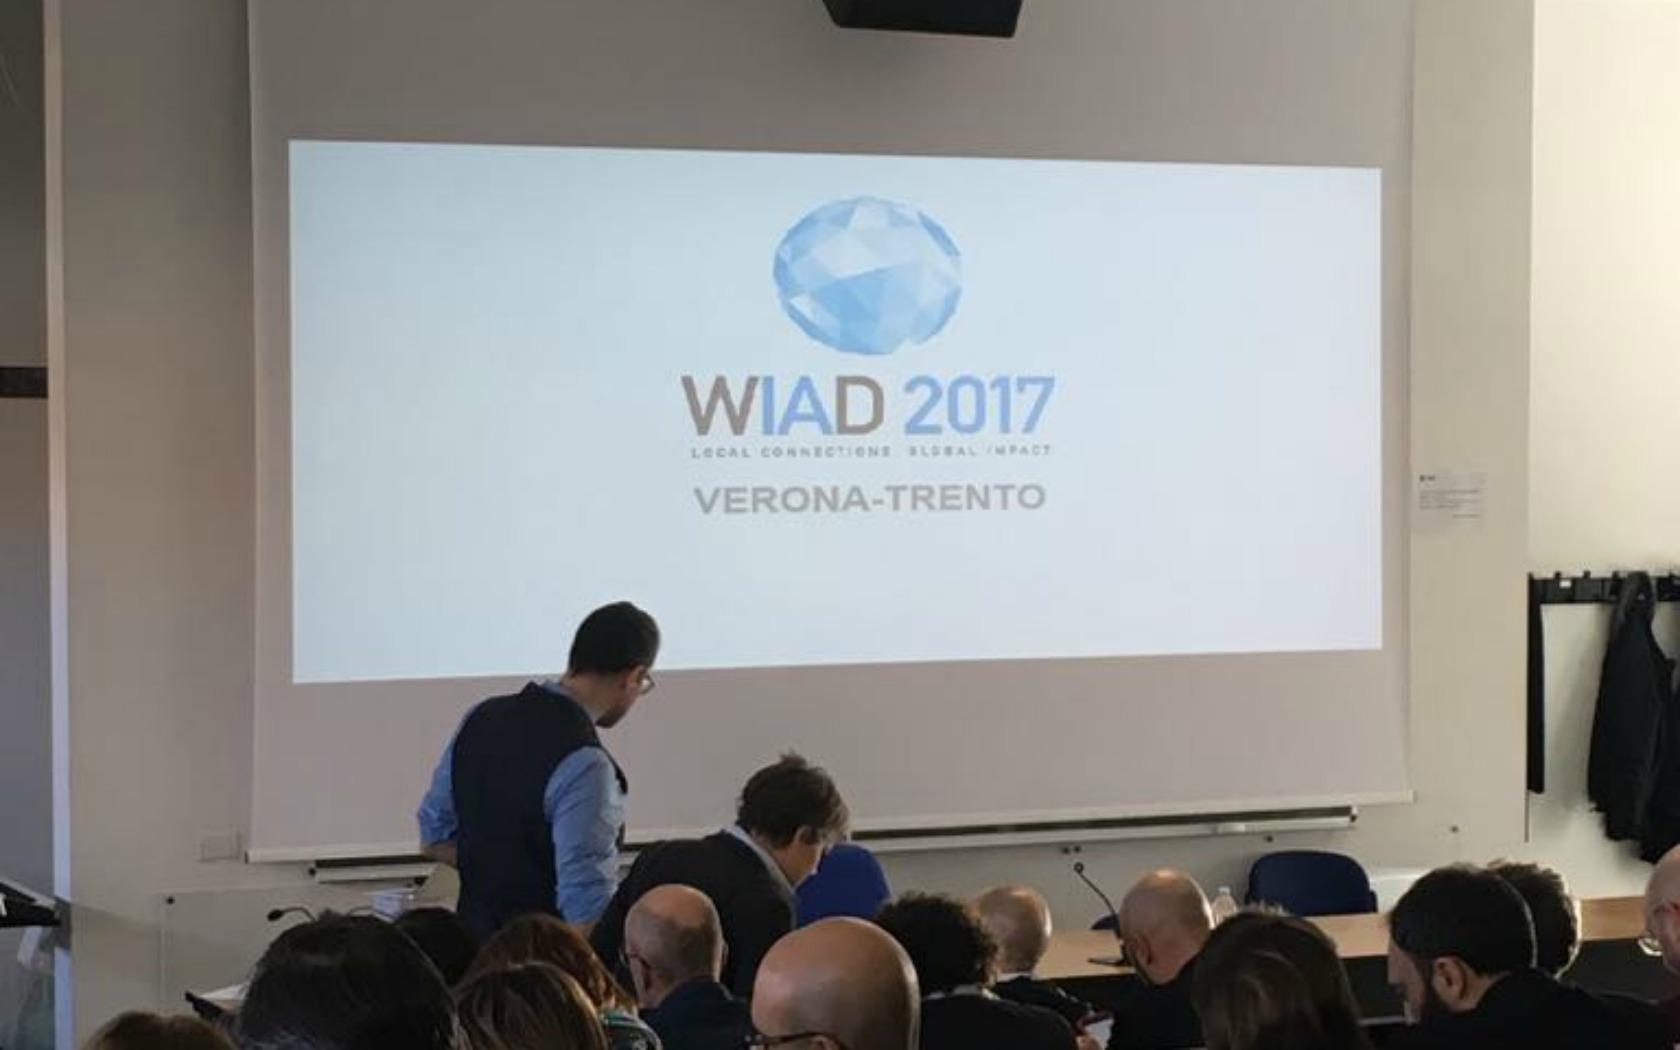 Wiad 2017 Verona Trento